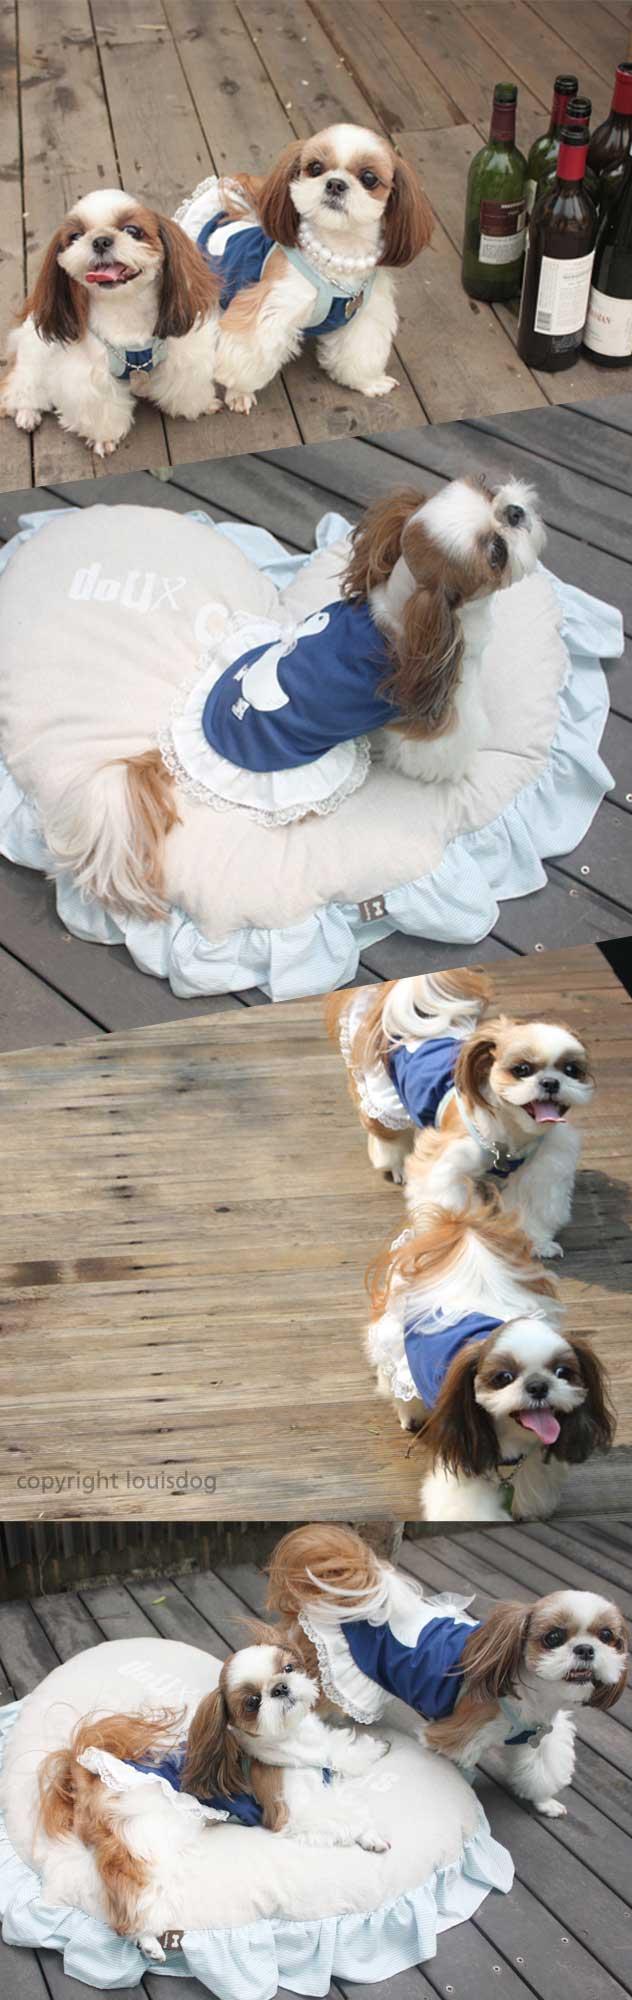 Louisdog Duckling Dance Dog Dress